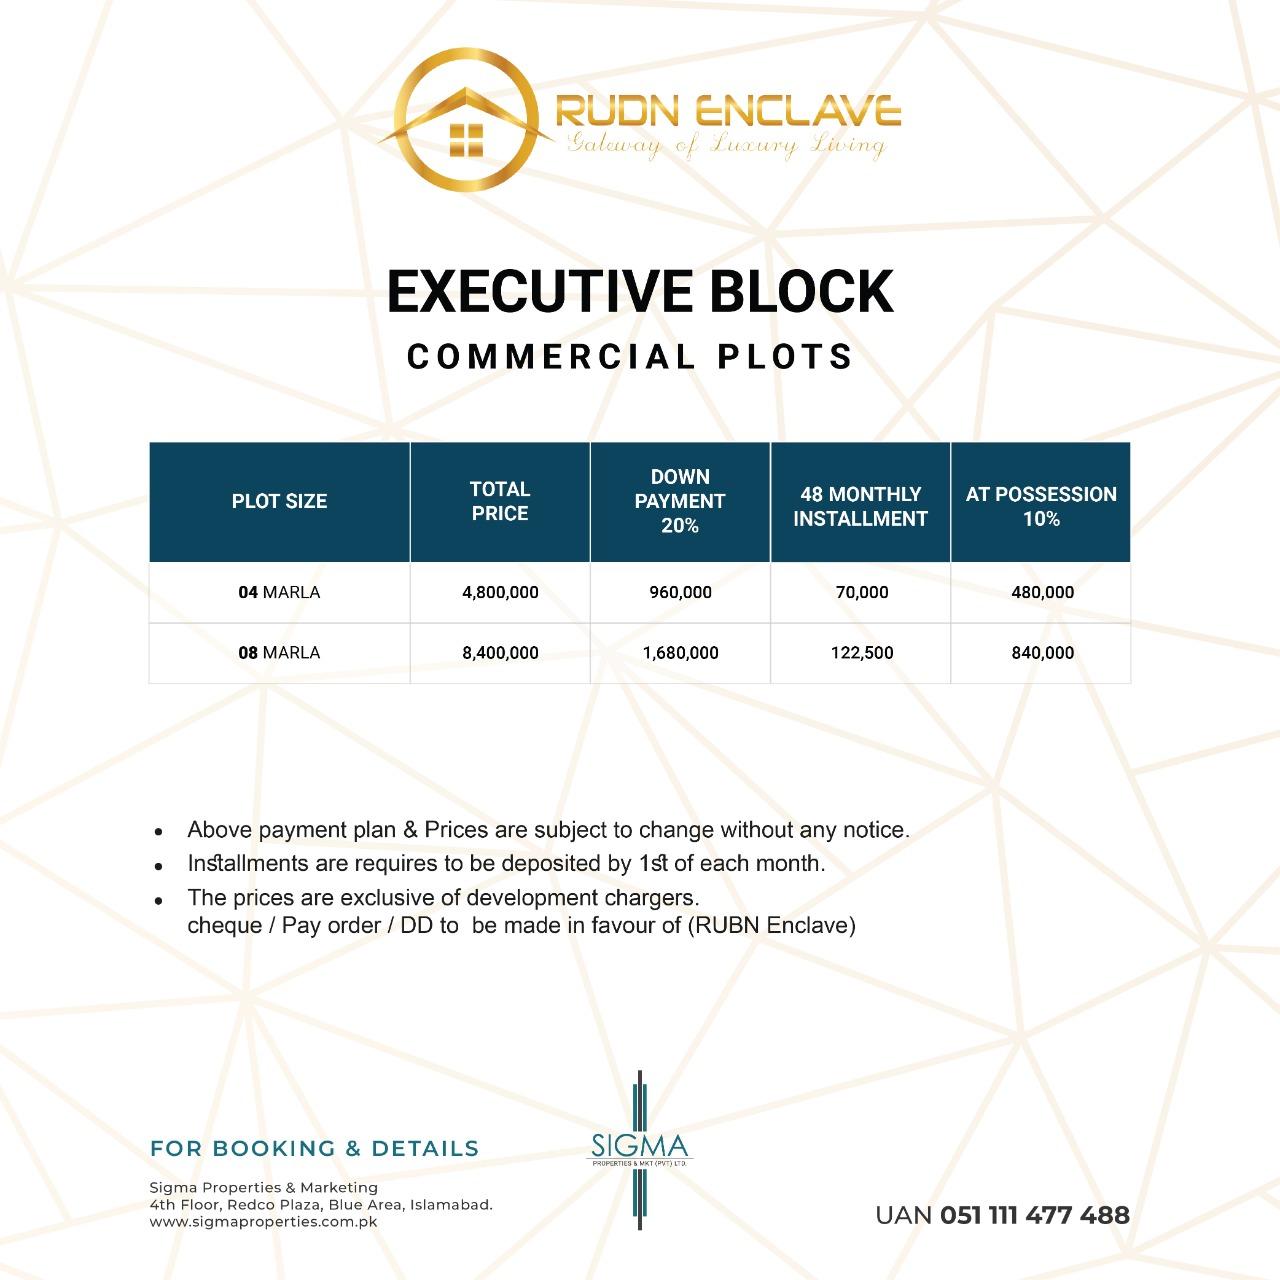 executive block commercial plot of rudn enclave